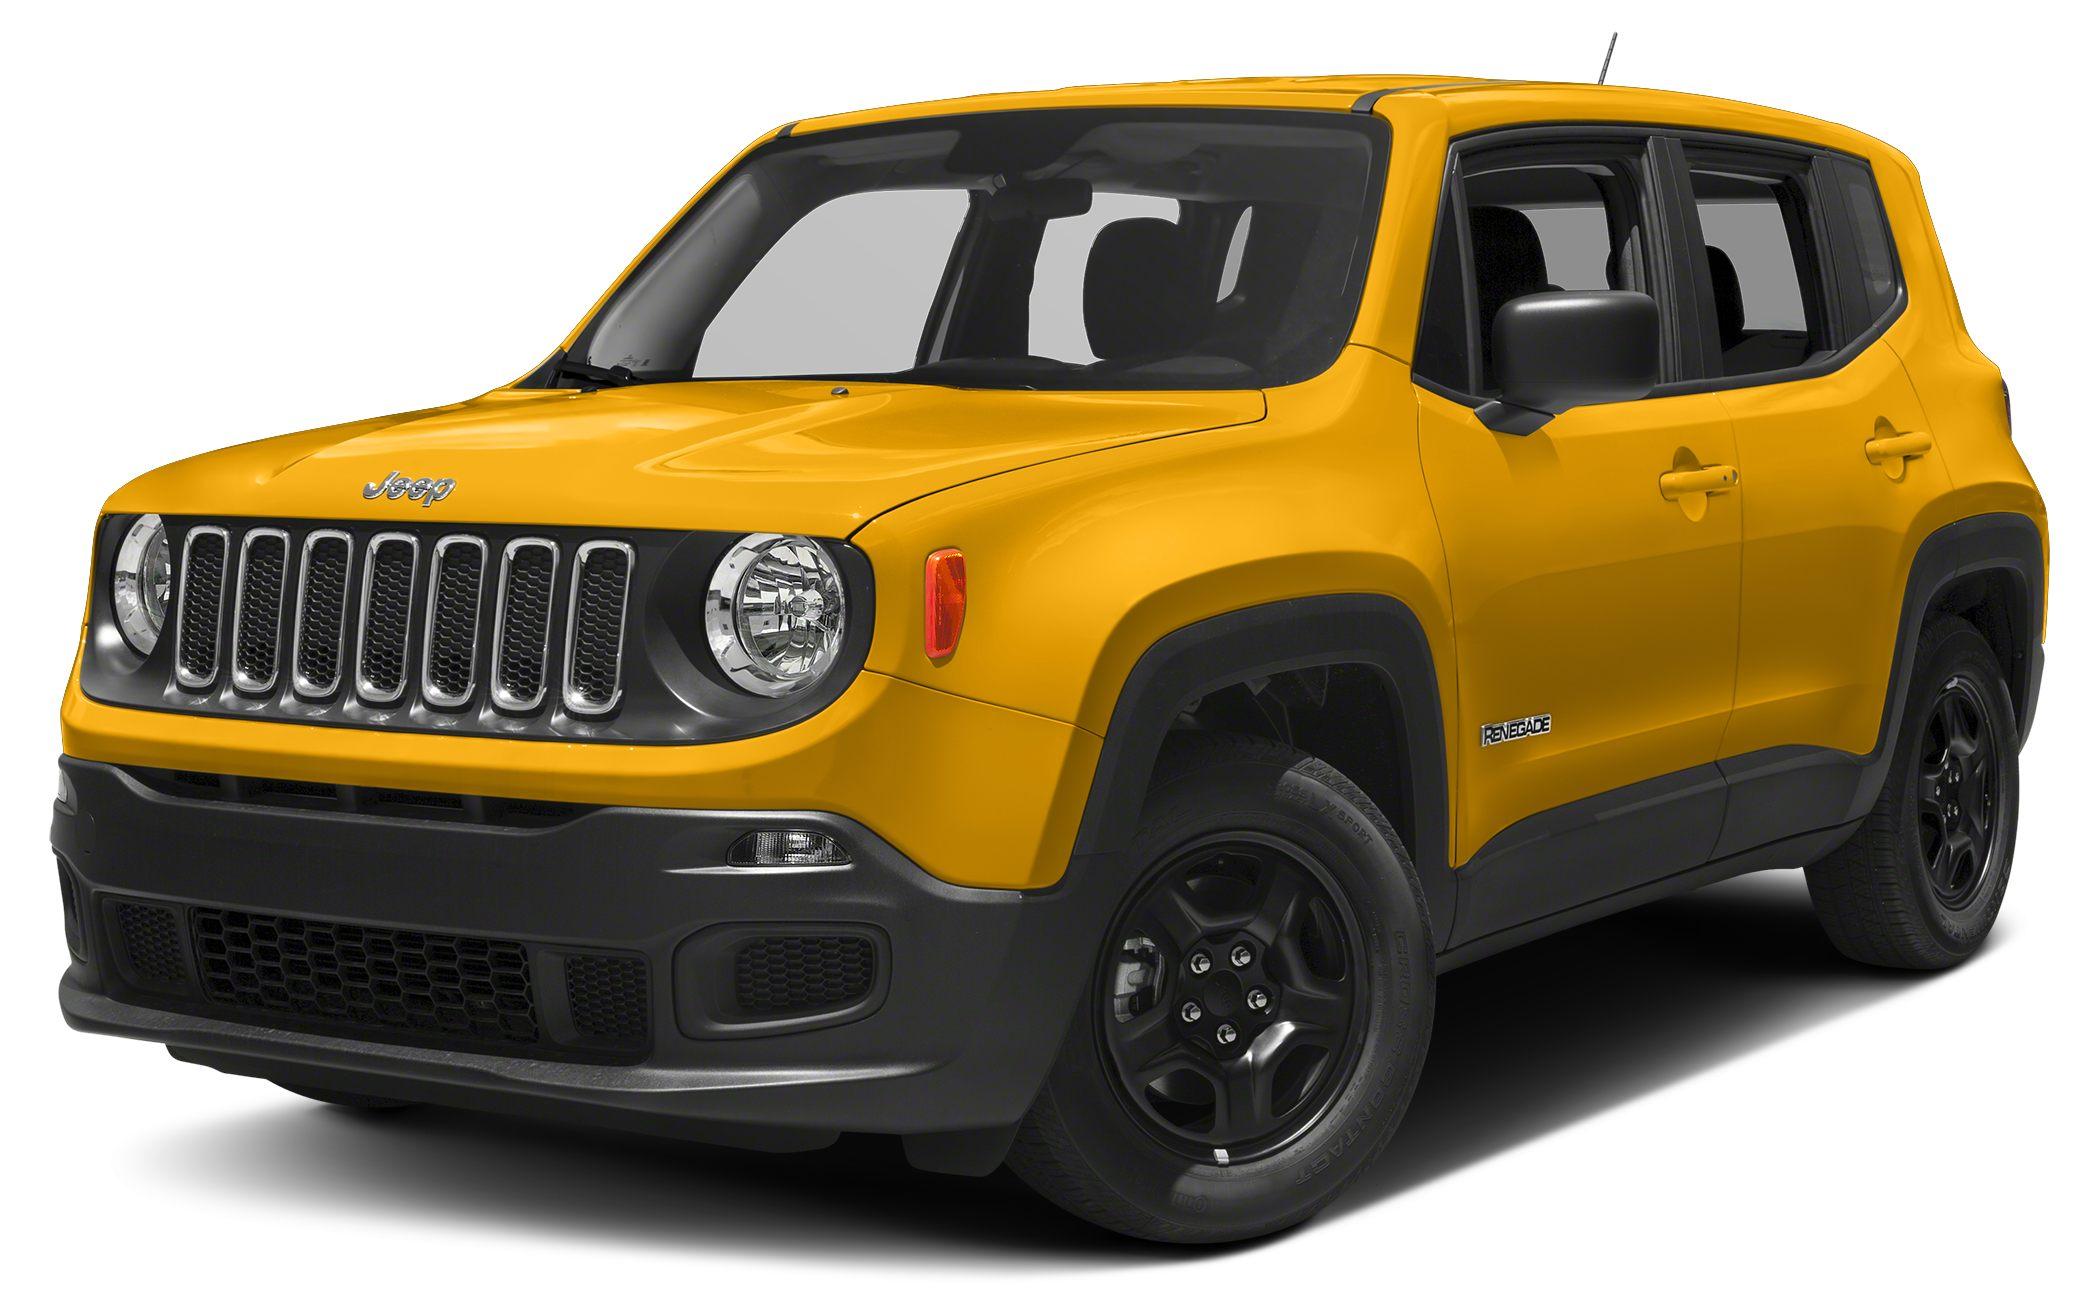 Tempe Chrysler Jeep Dodge Ram 2018 Dodge Reviews